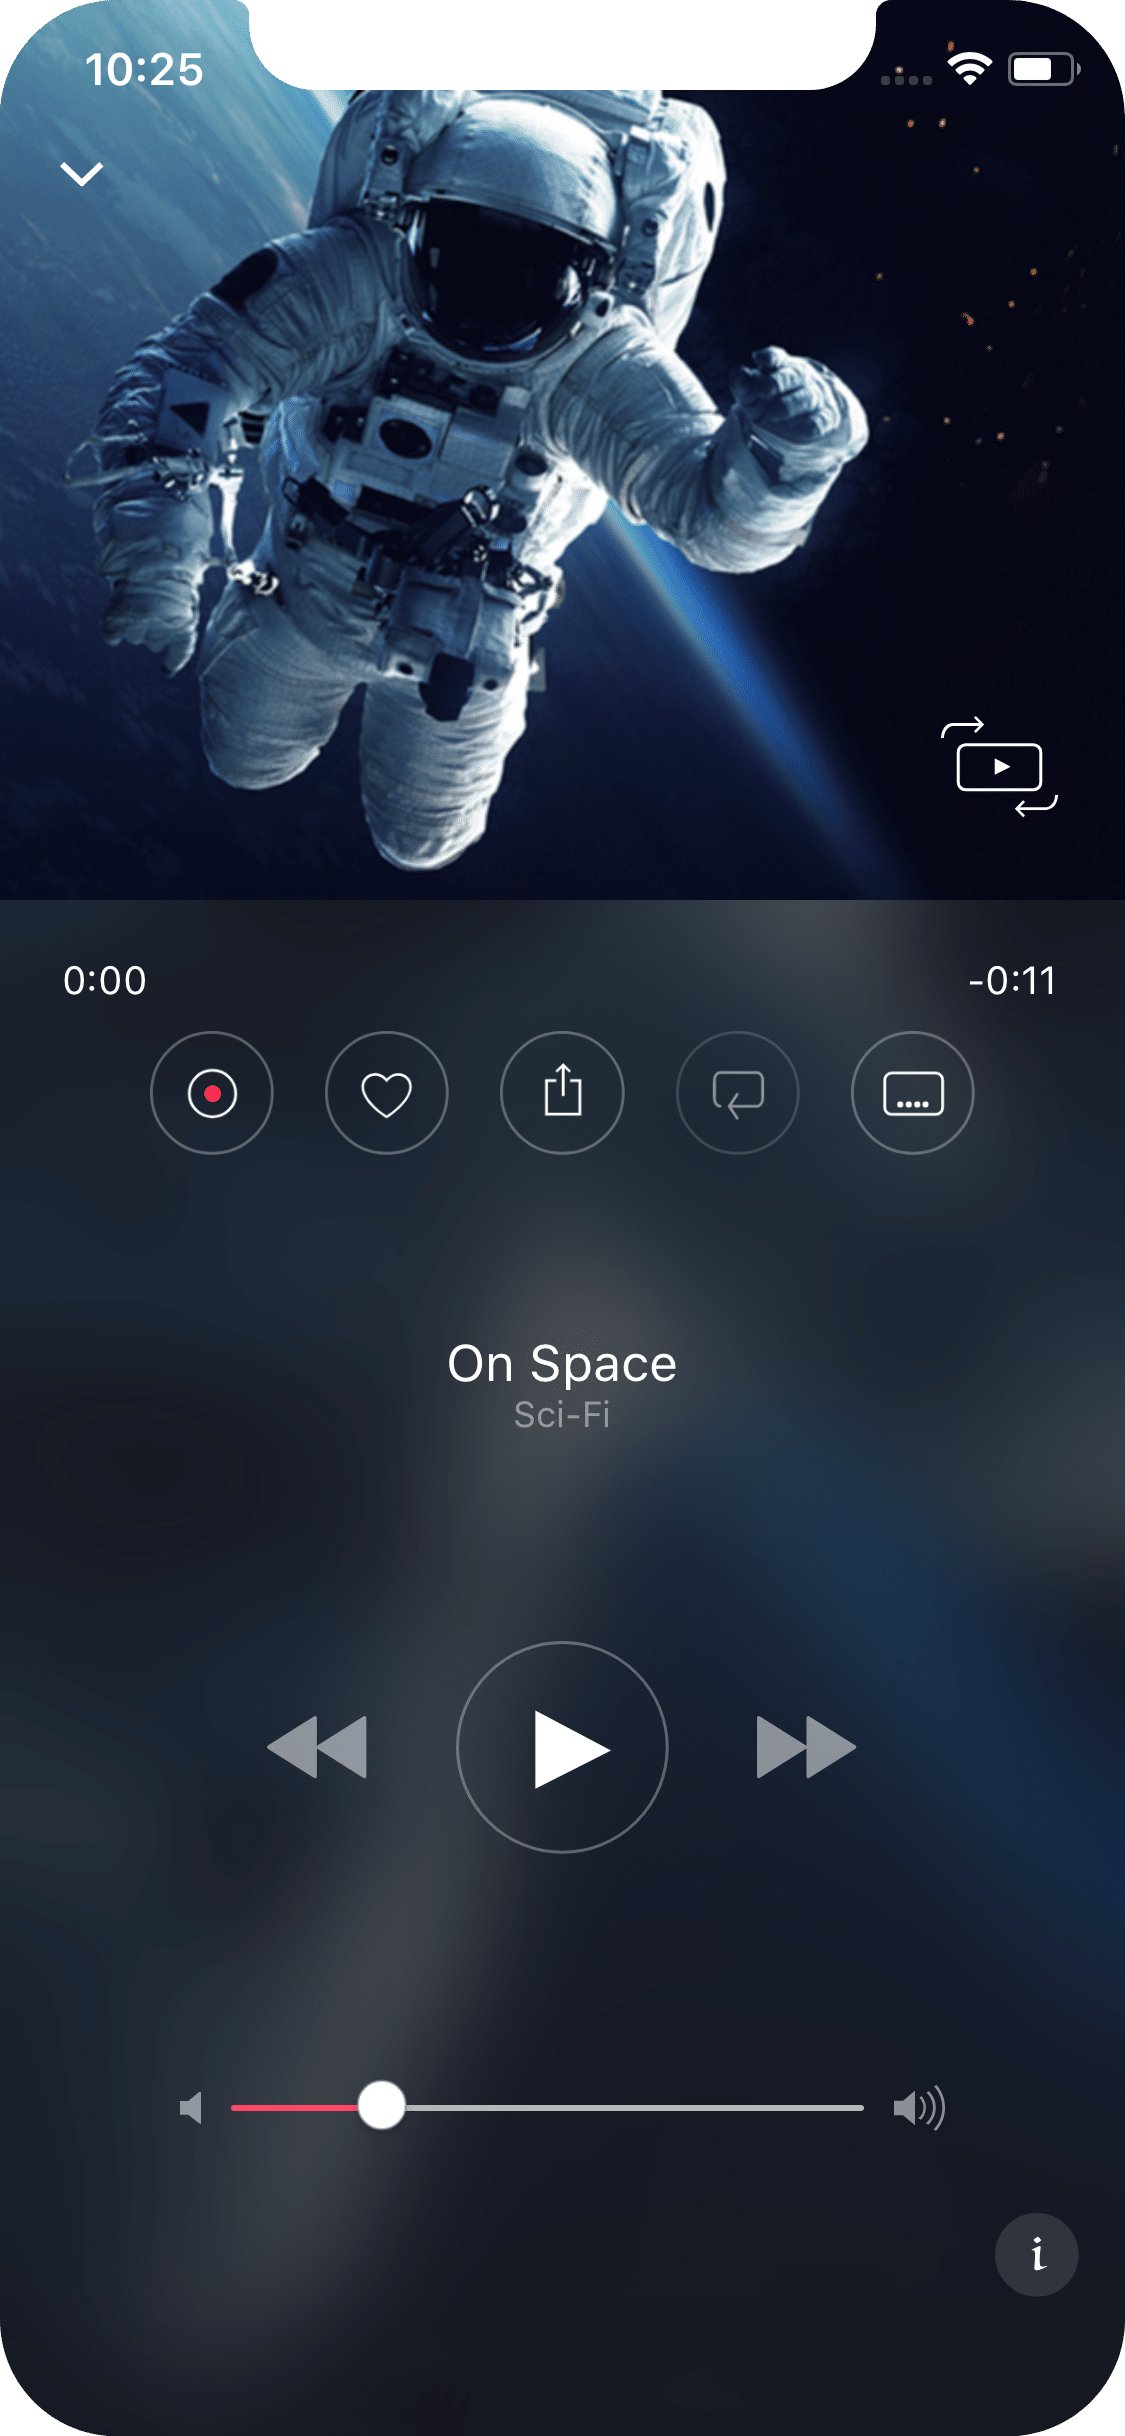 ONTV universal OTT app remote control